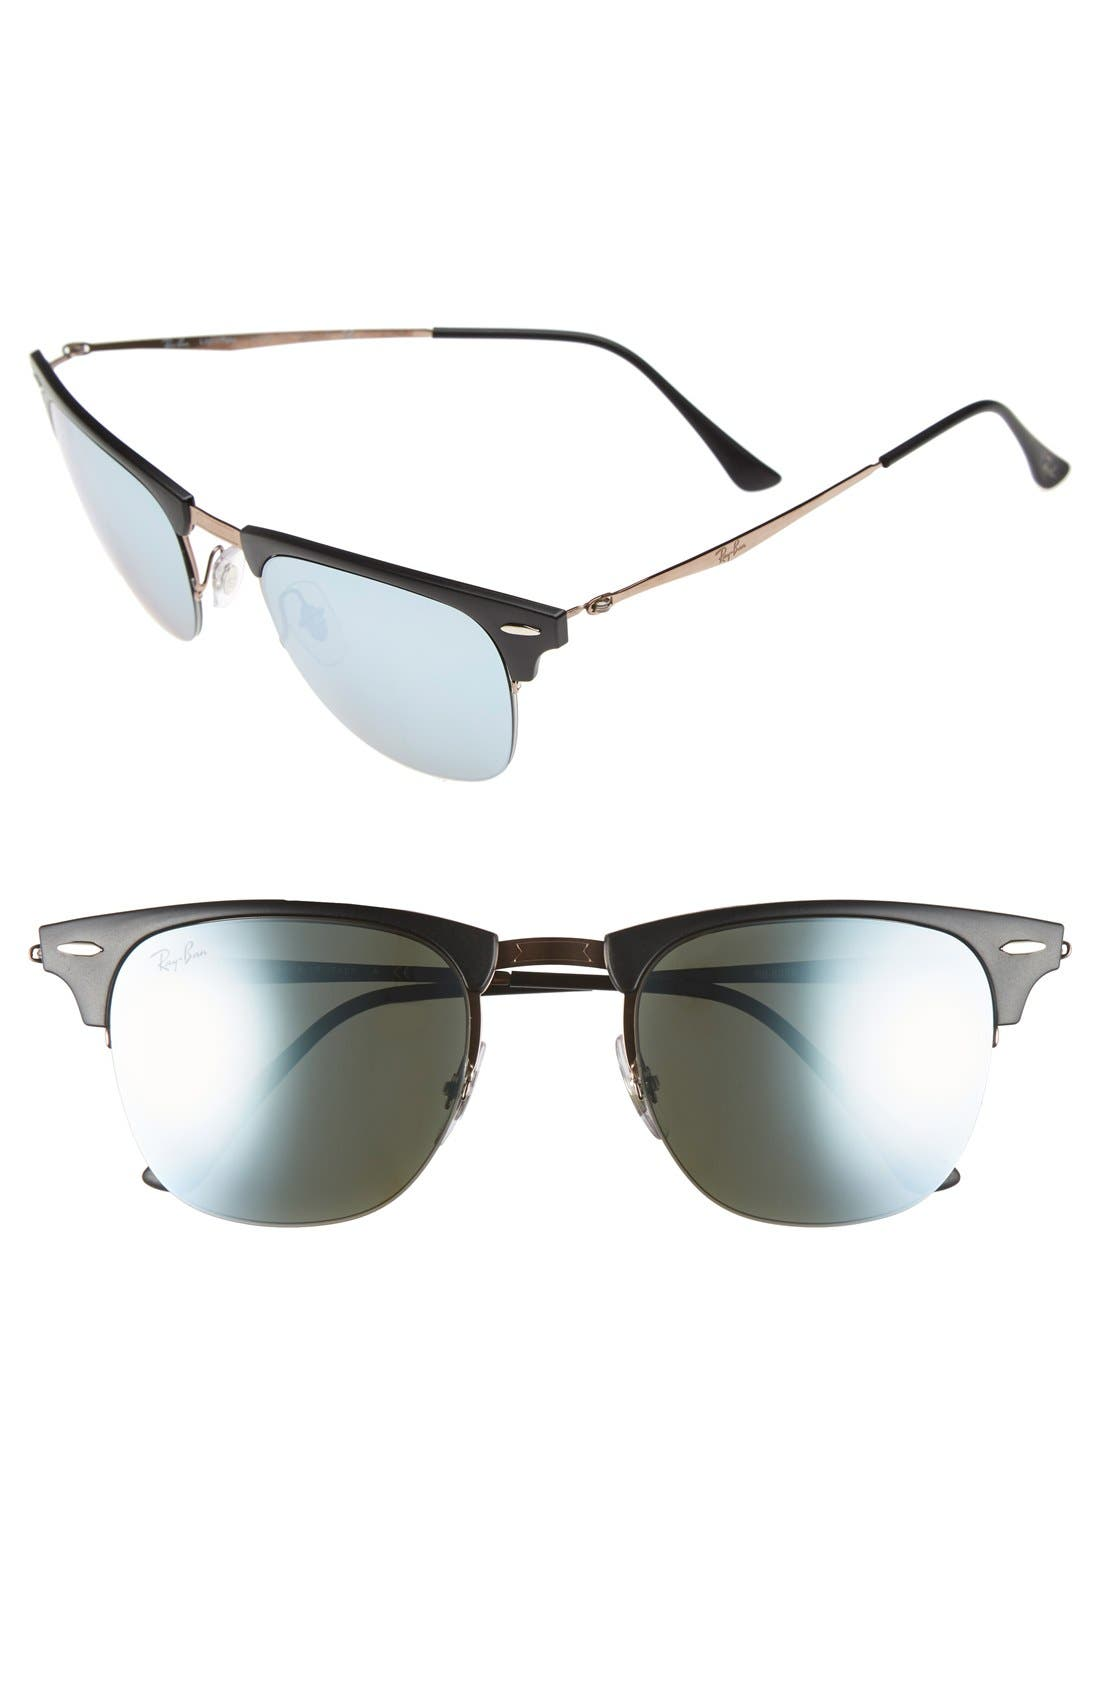 Main Image - Ray-Ban 'Clubmaster' 51mm Sunglasses